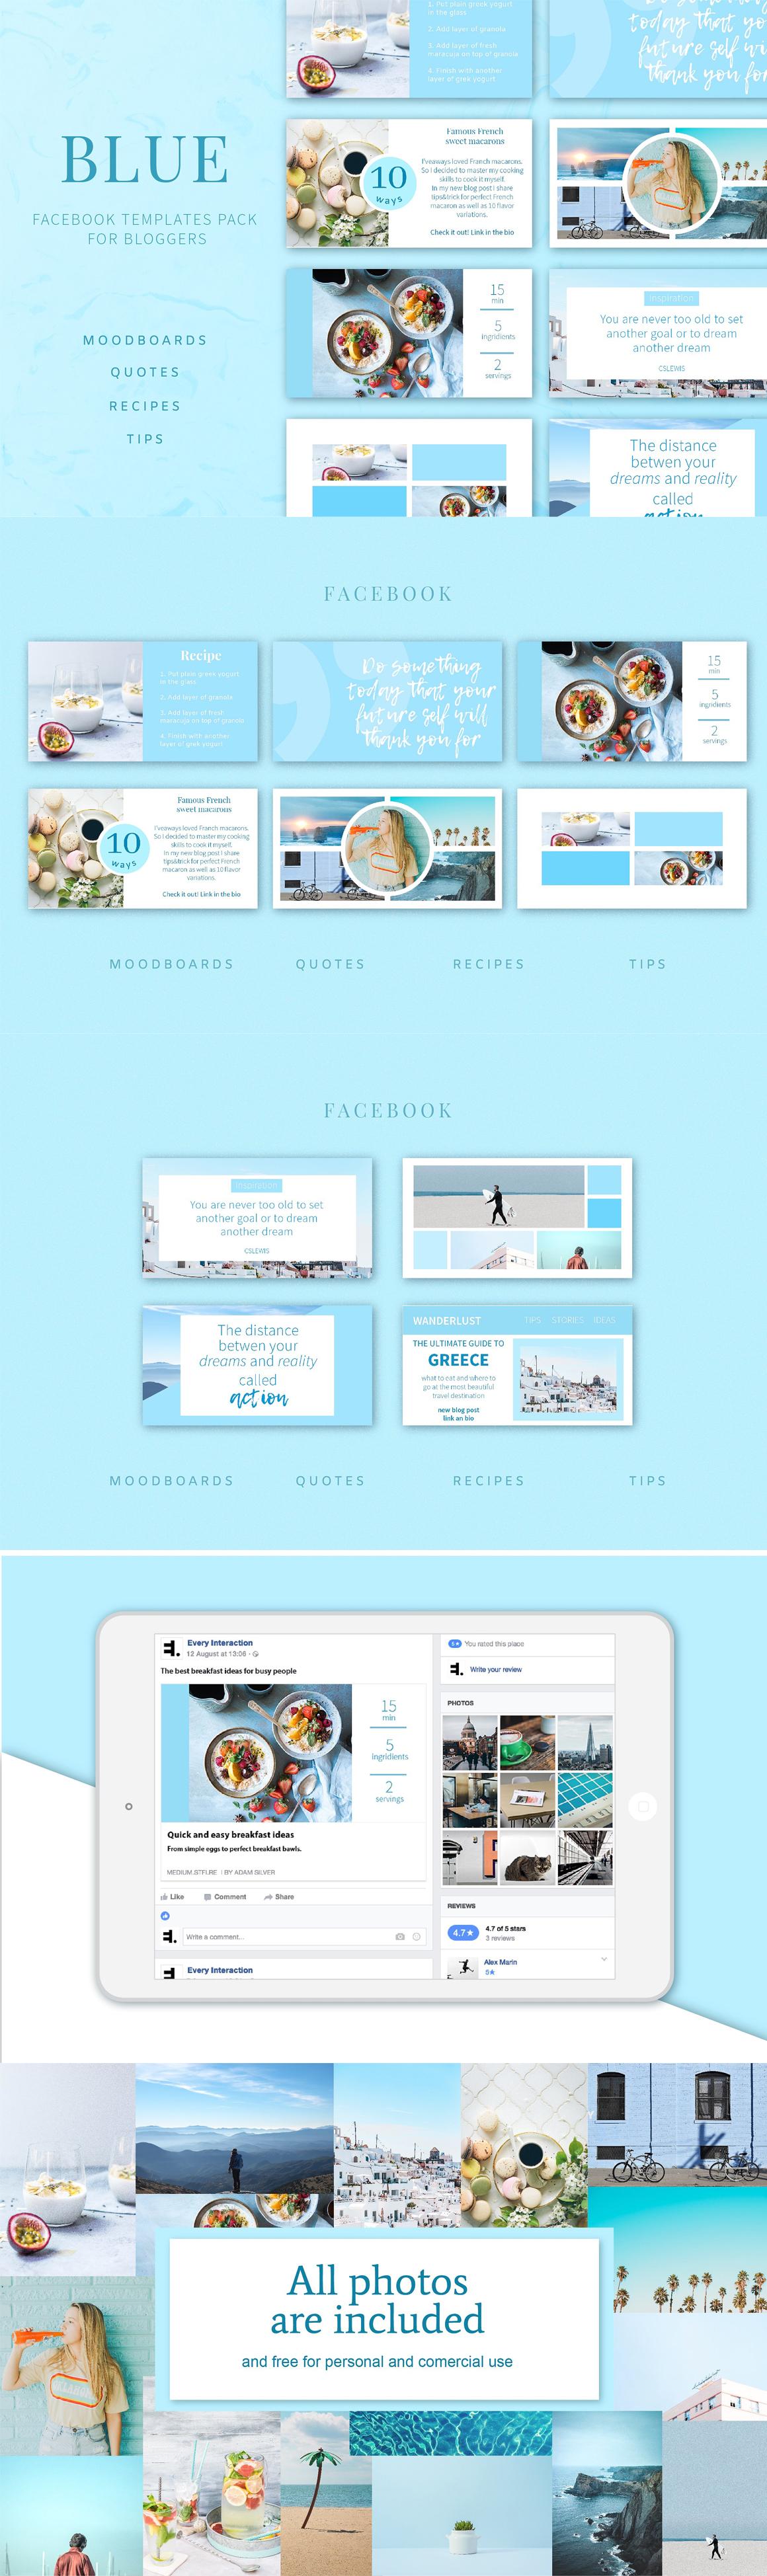 blue facebook post templates pack psd social media templates